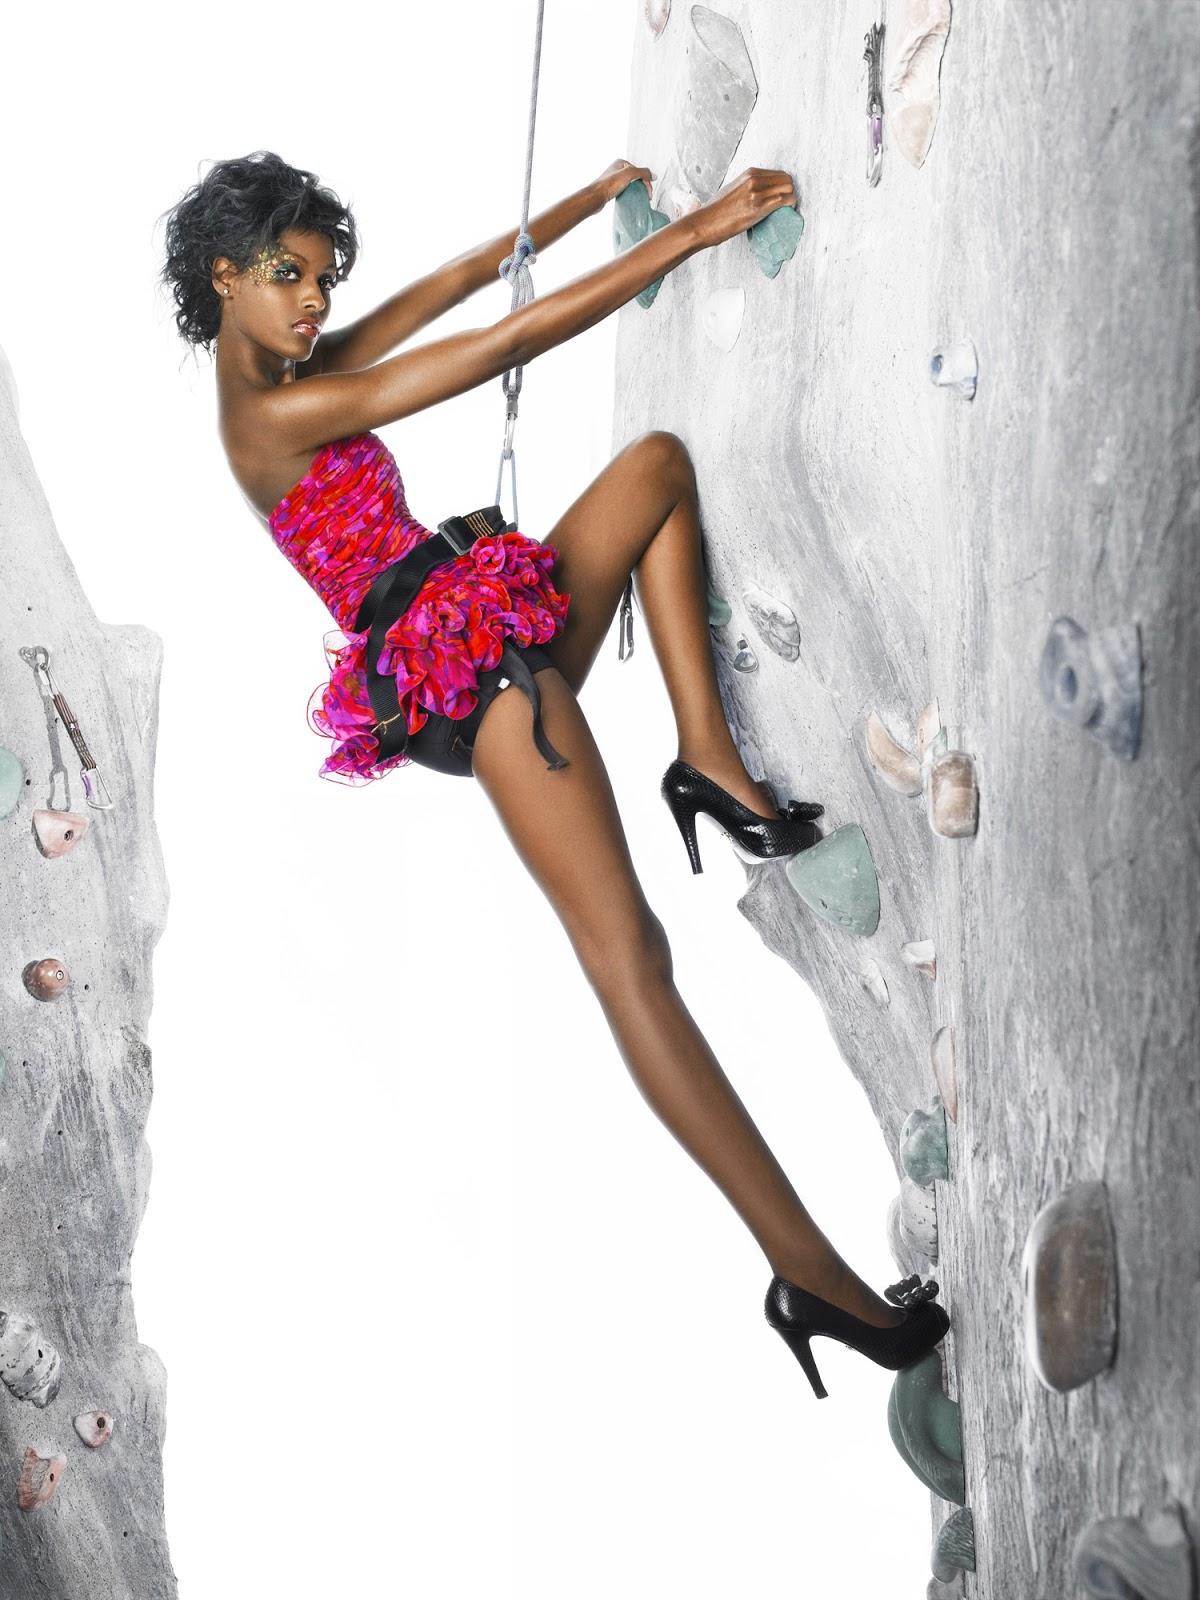 Ebony Rock 120